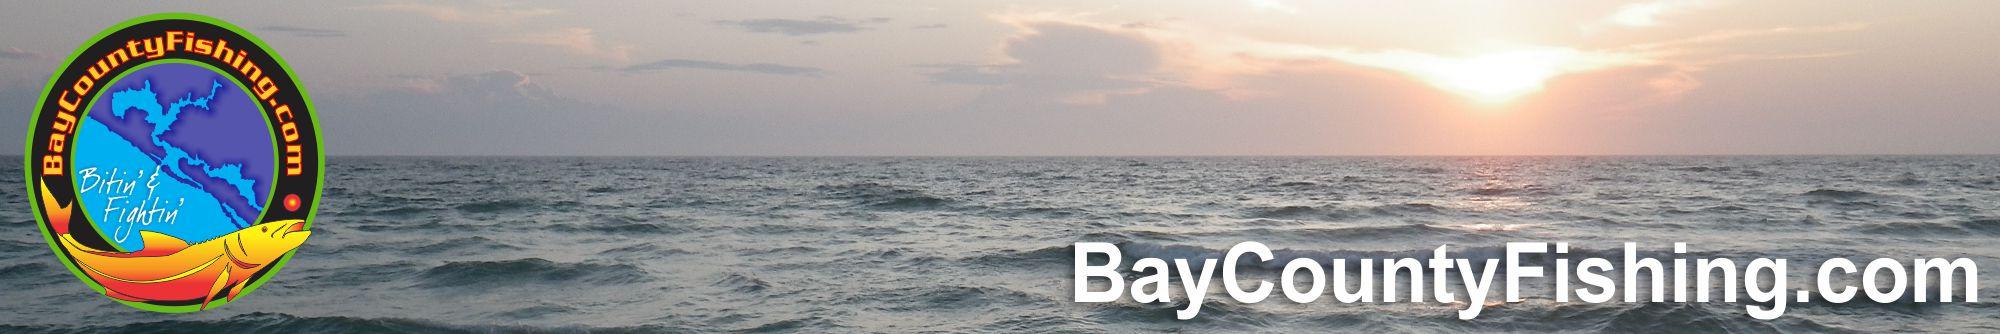 BayCountyFishing.com